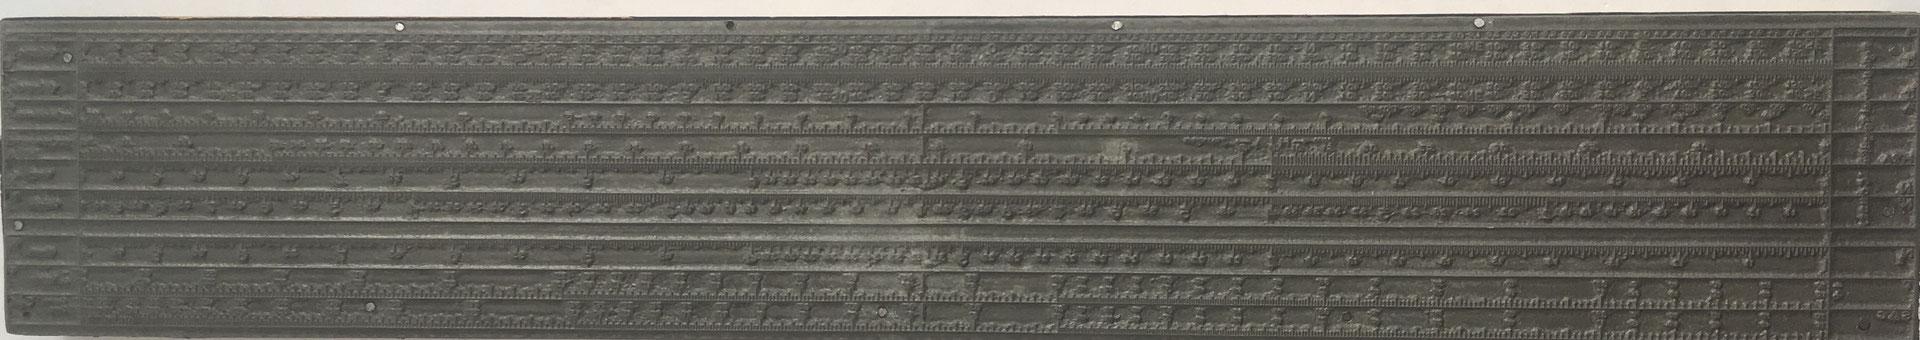 Cliché (matriz o plancha) de metal sobre base de madera para máquina plana de la Regla Universal Tipográfica CONDE (modelo 2), 43.5x7.5 cm